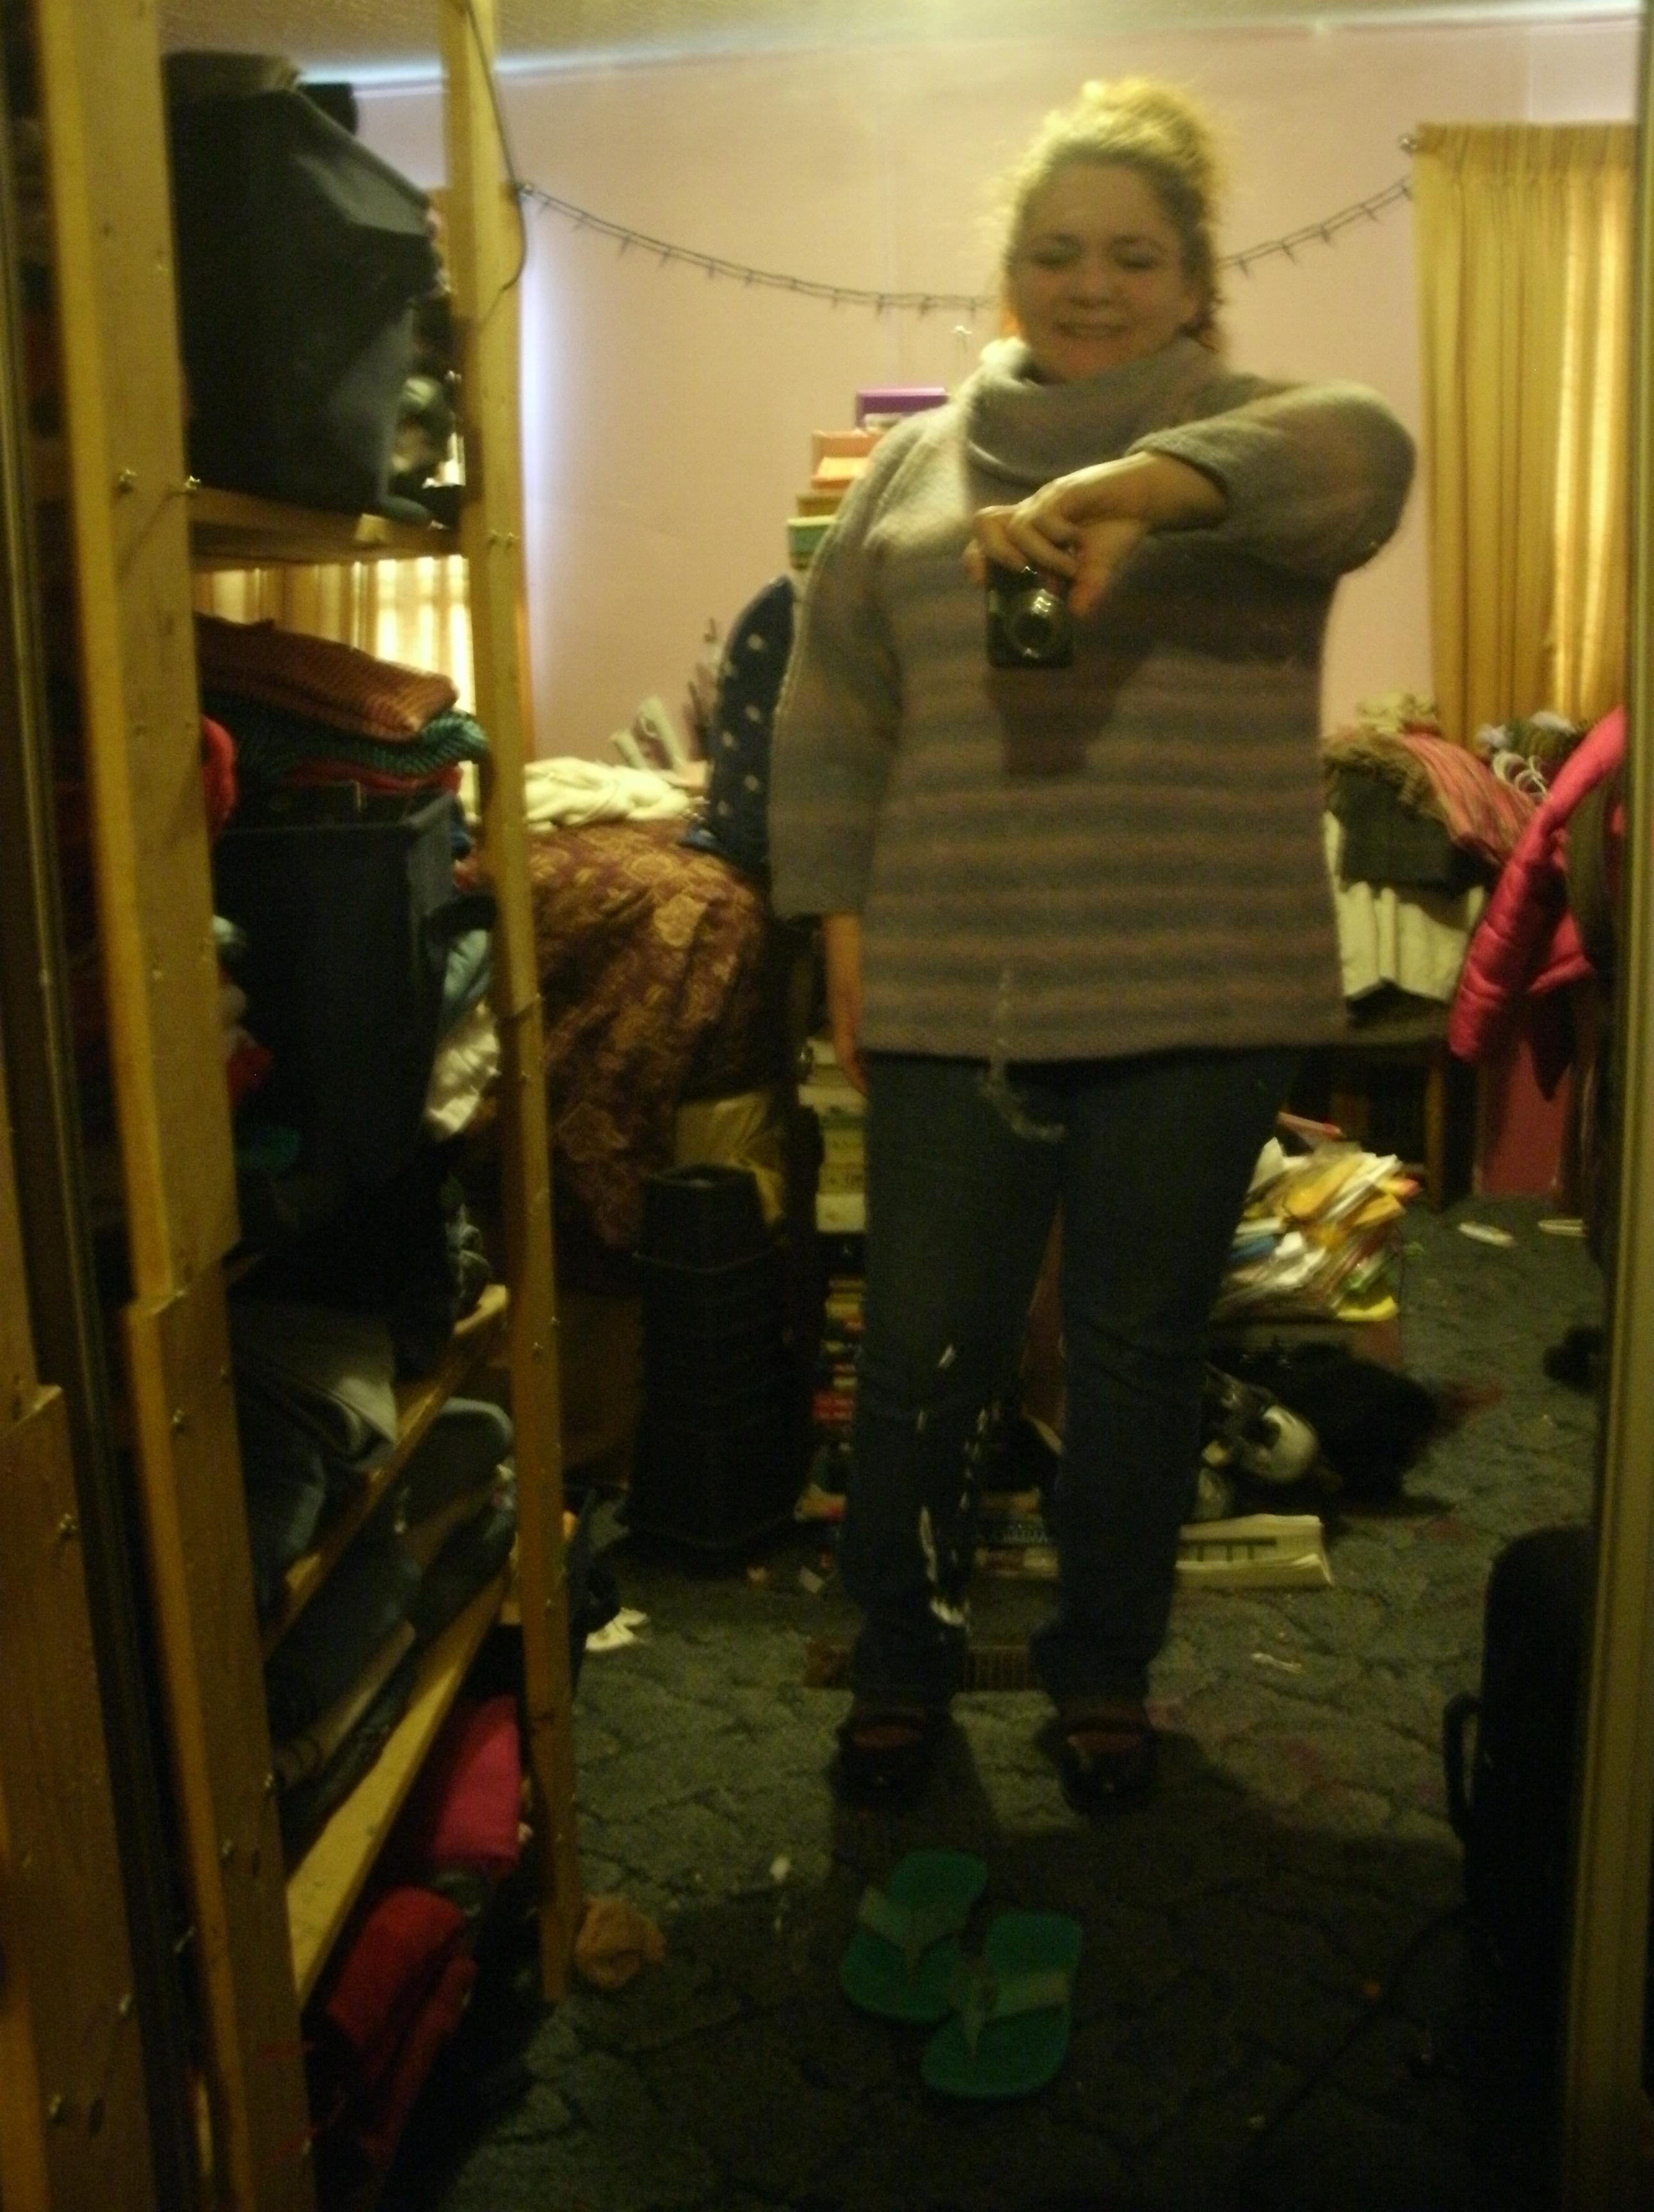 sweater jan 23